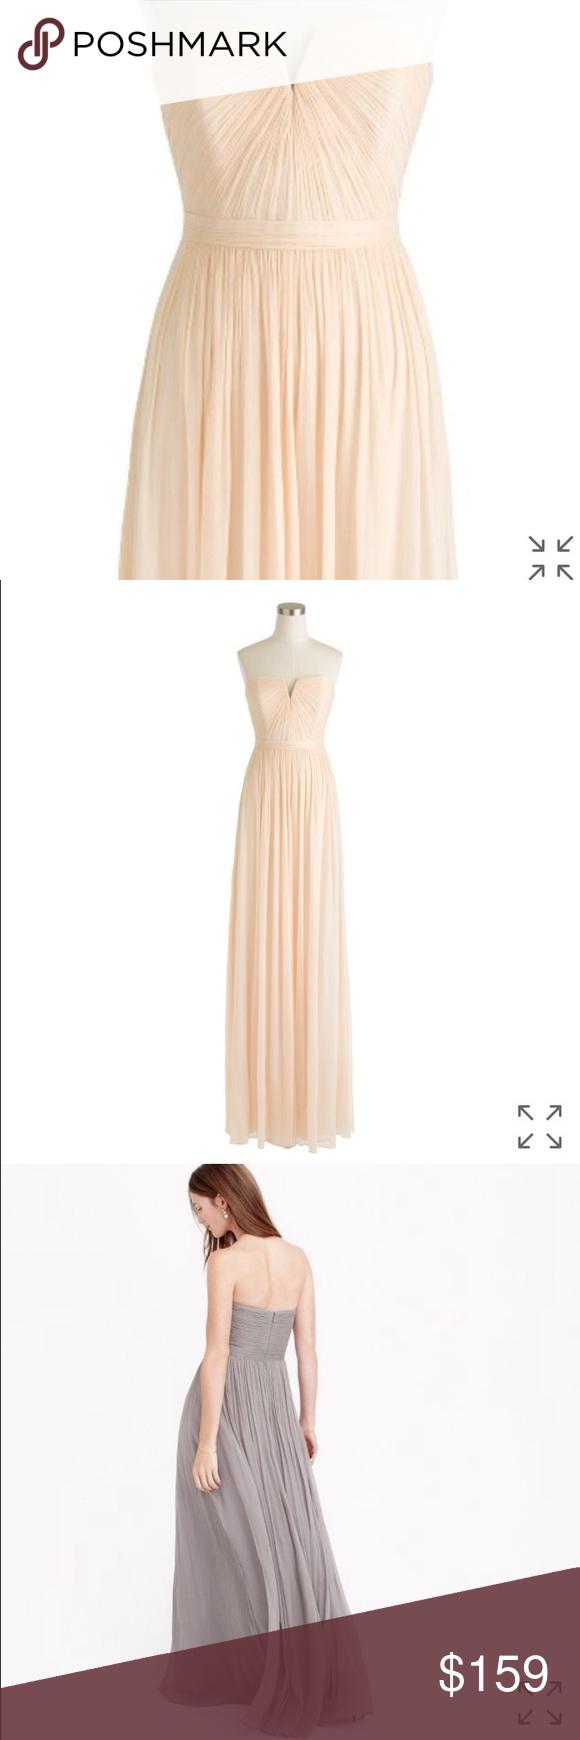 J Crew Nadia Champagne Silk Gown 0P | Pinterest